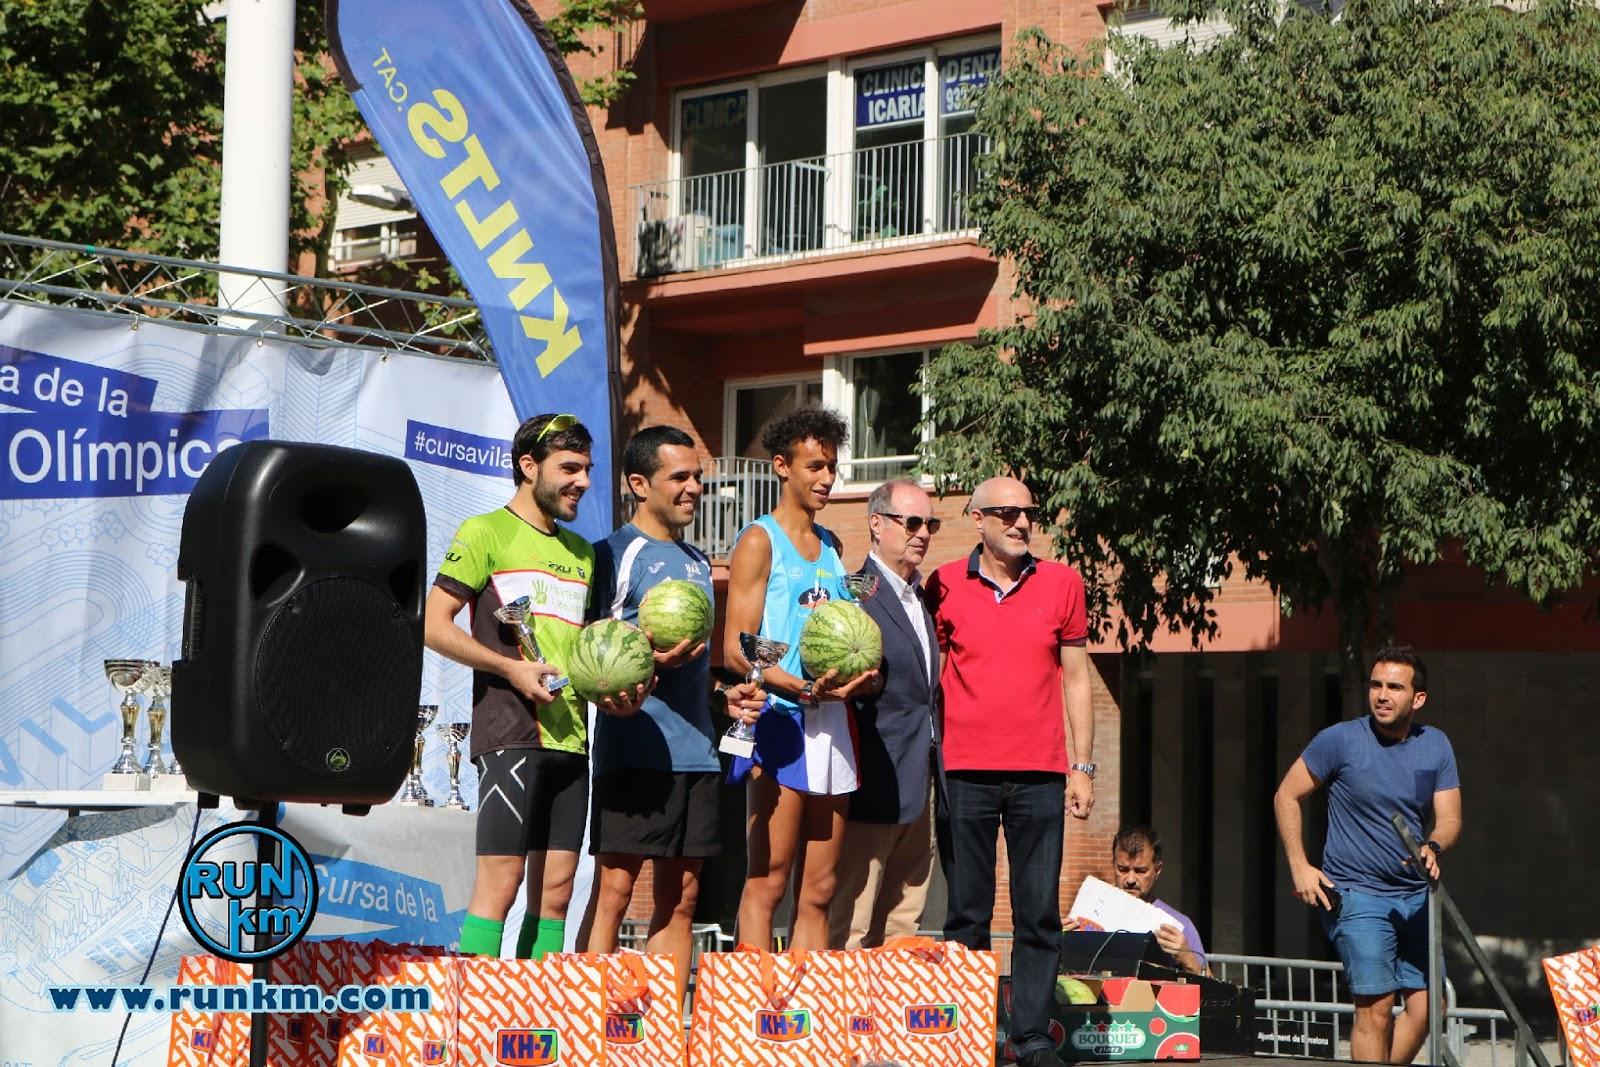 Podio Masculino 5K - Cursa Vila Olímpica 2017